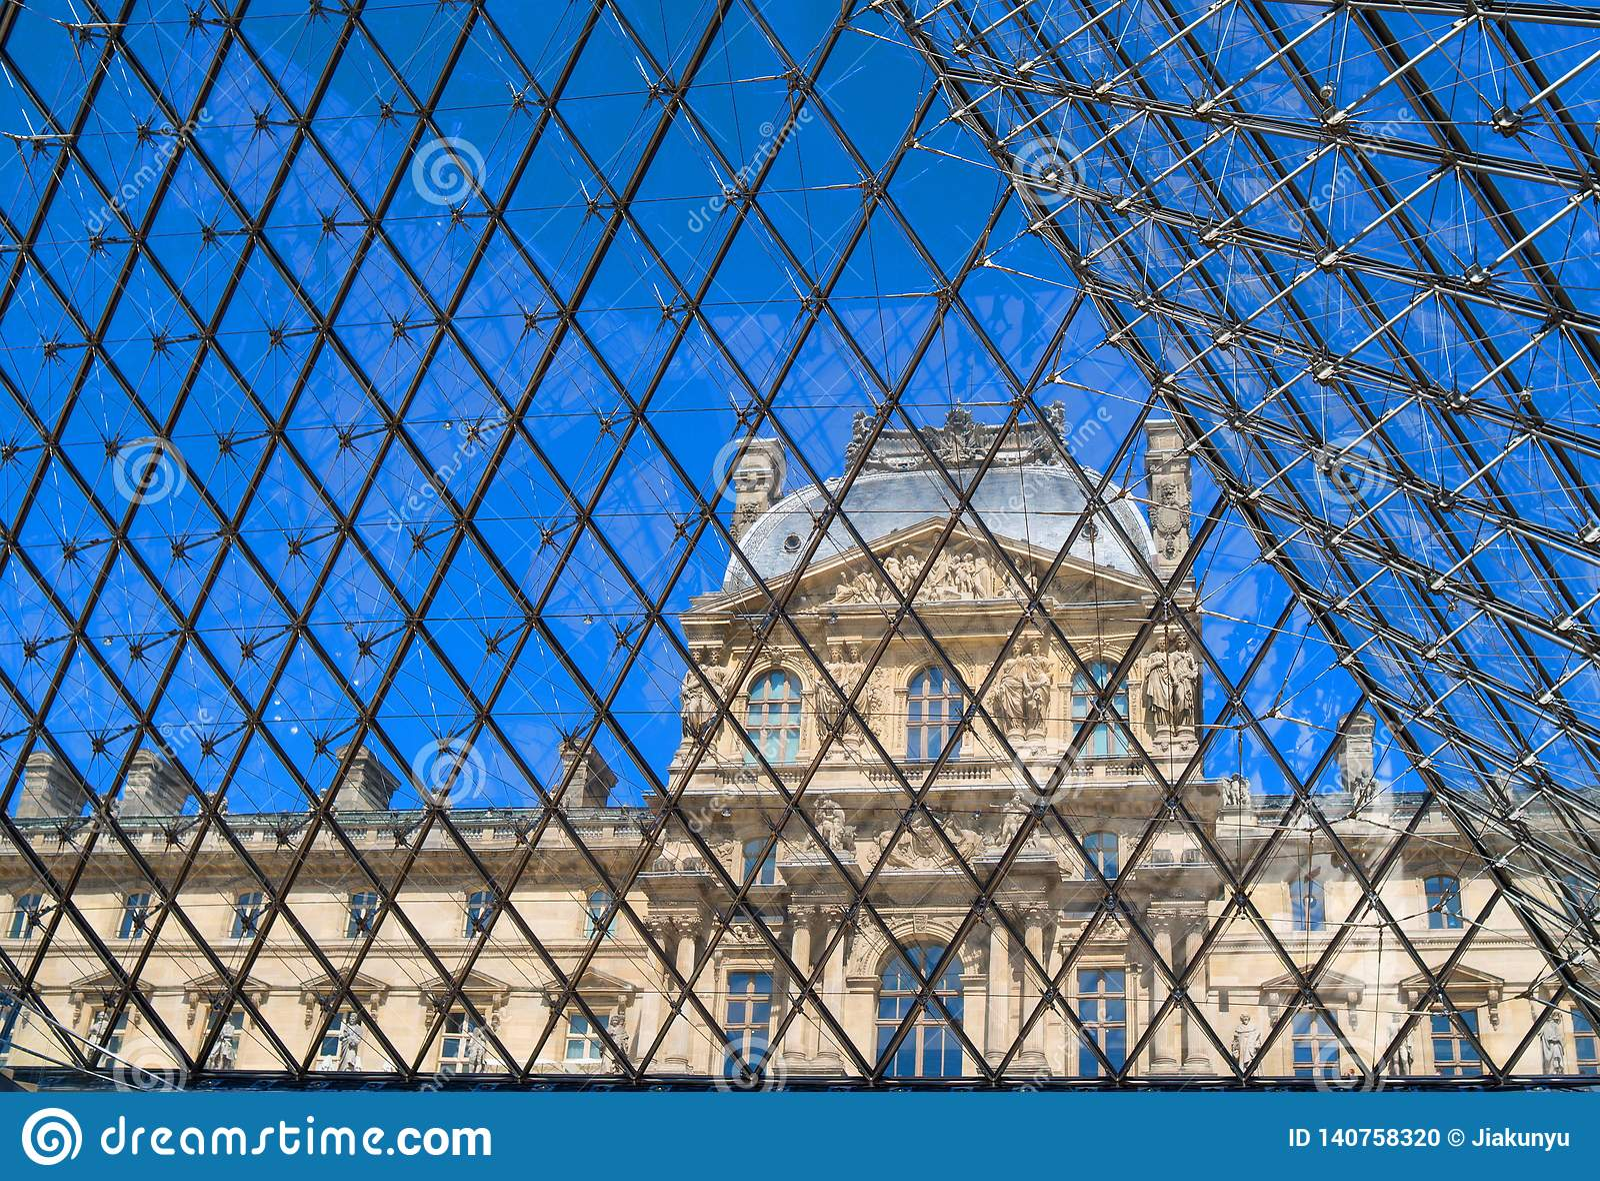 Жалюзи на решетке в Париже, Франции